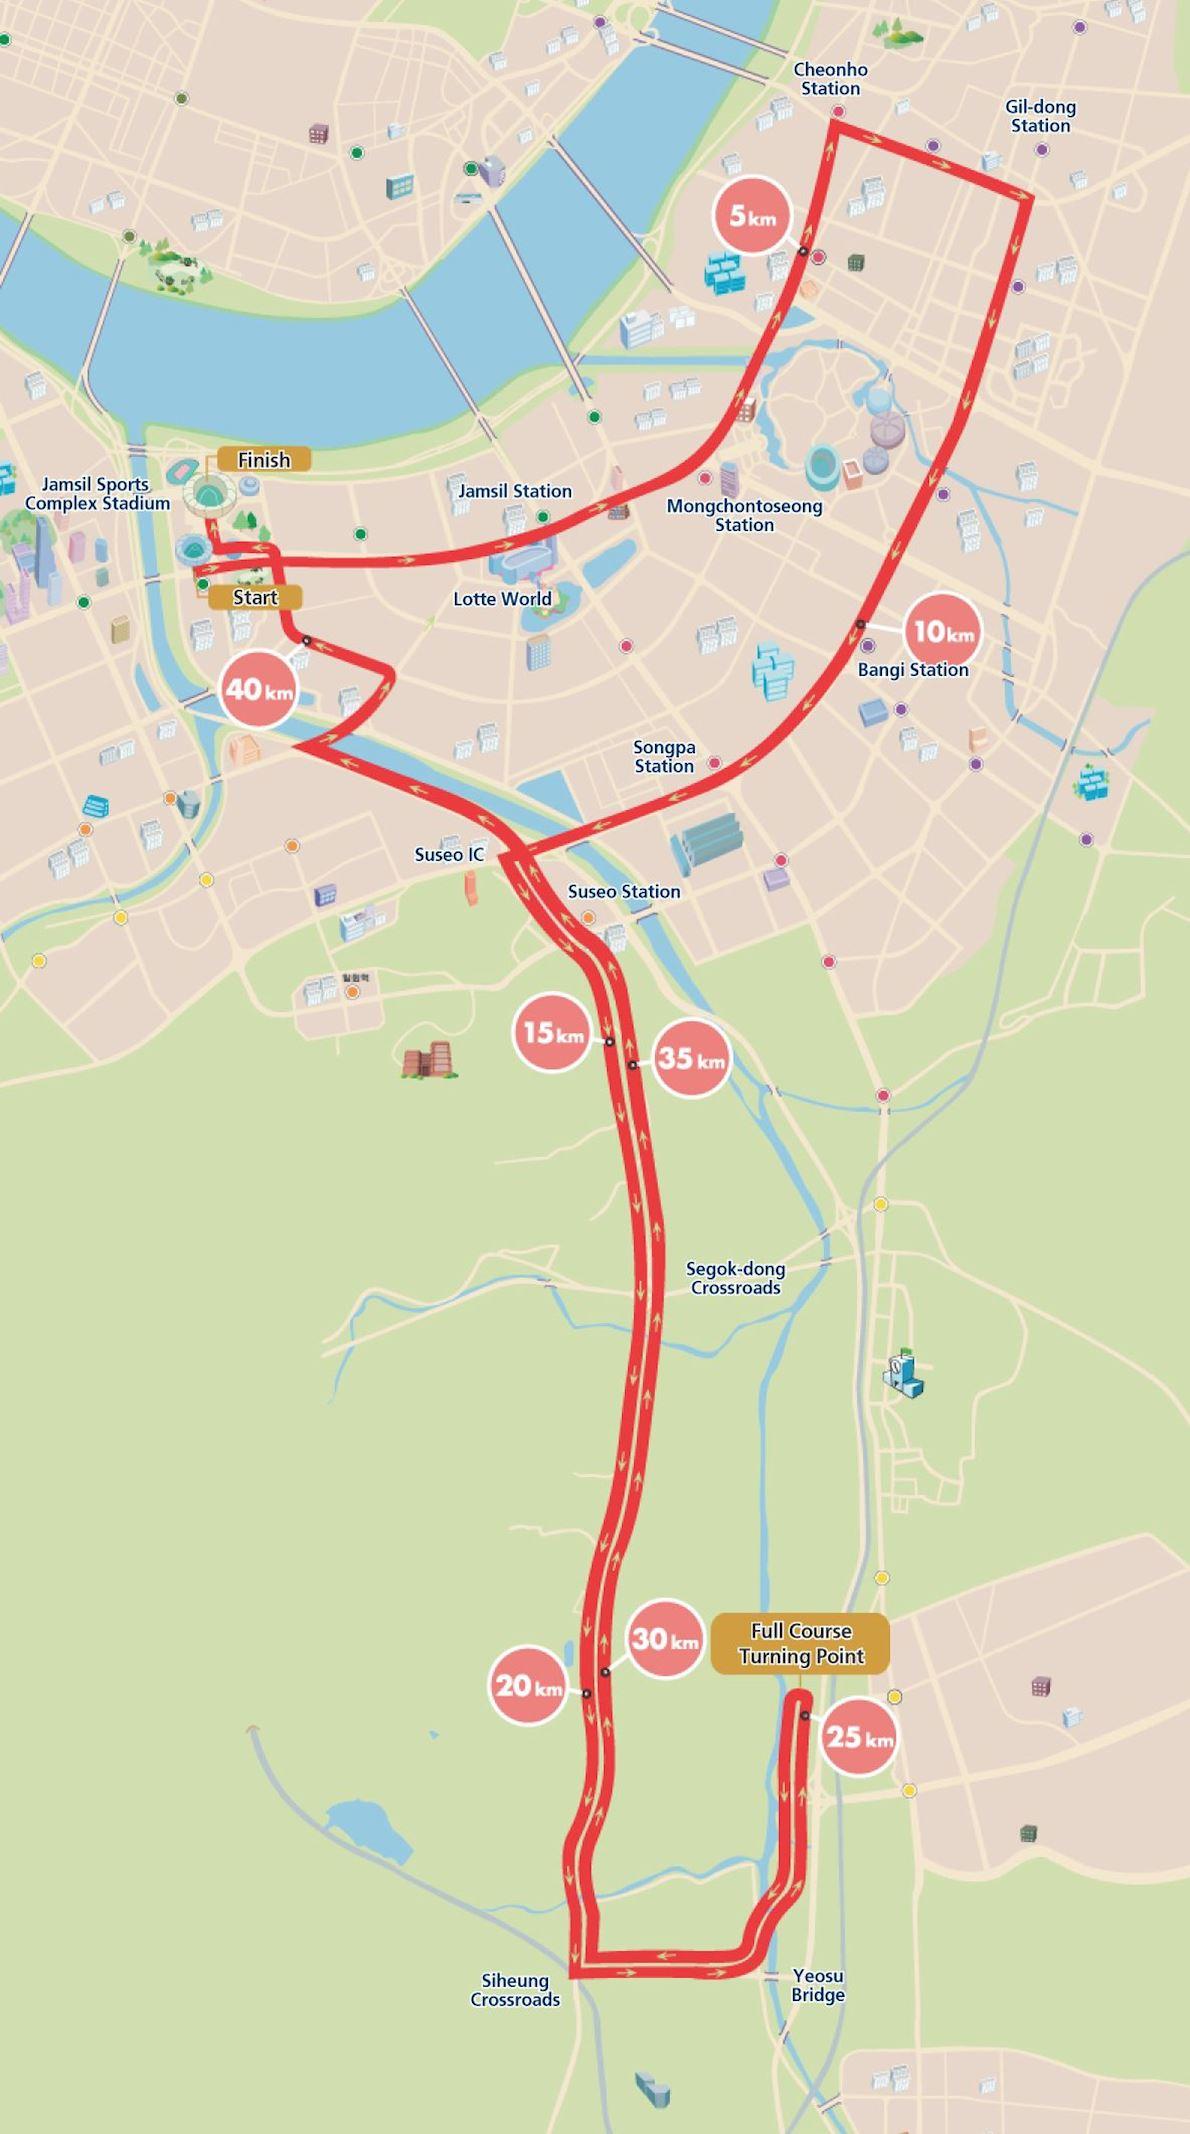 JTBC Seoul Marathon, former Joongang Seoul Marathon 路线图